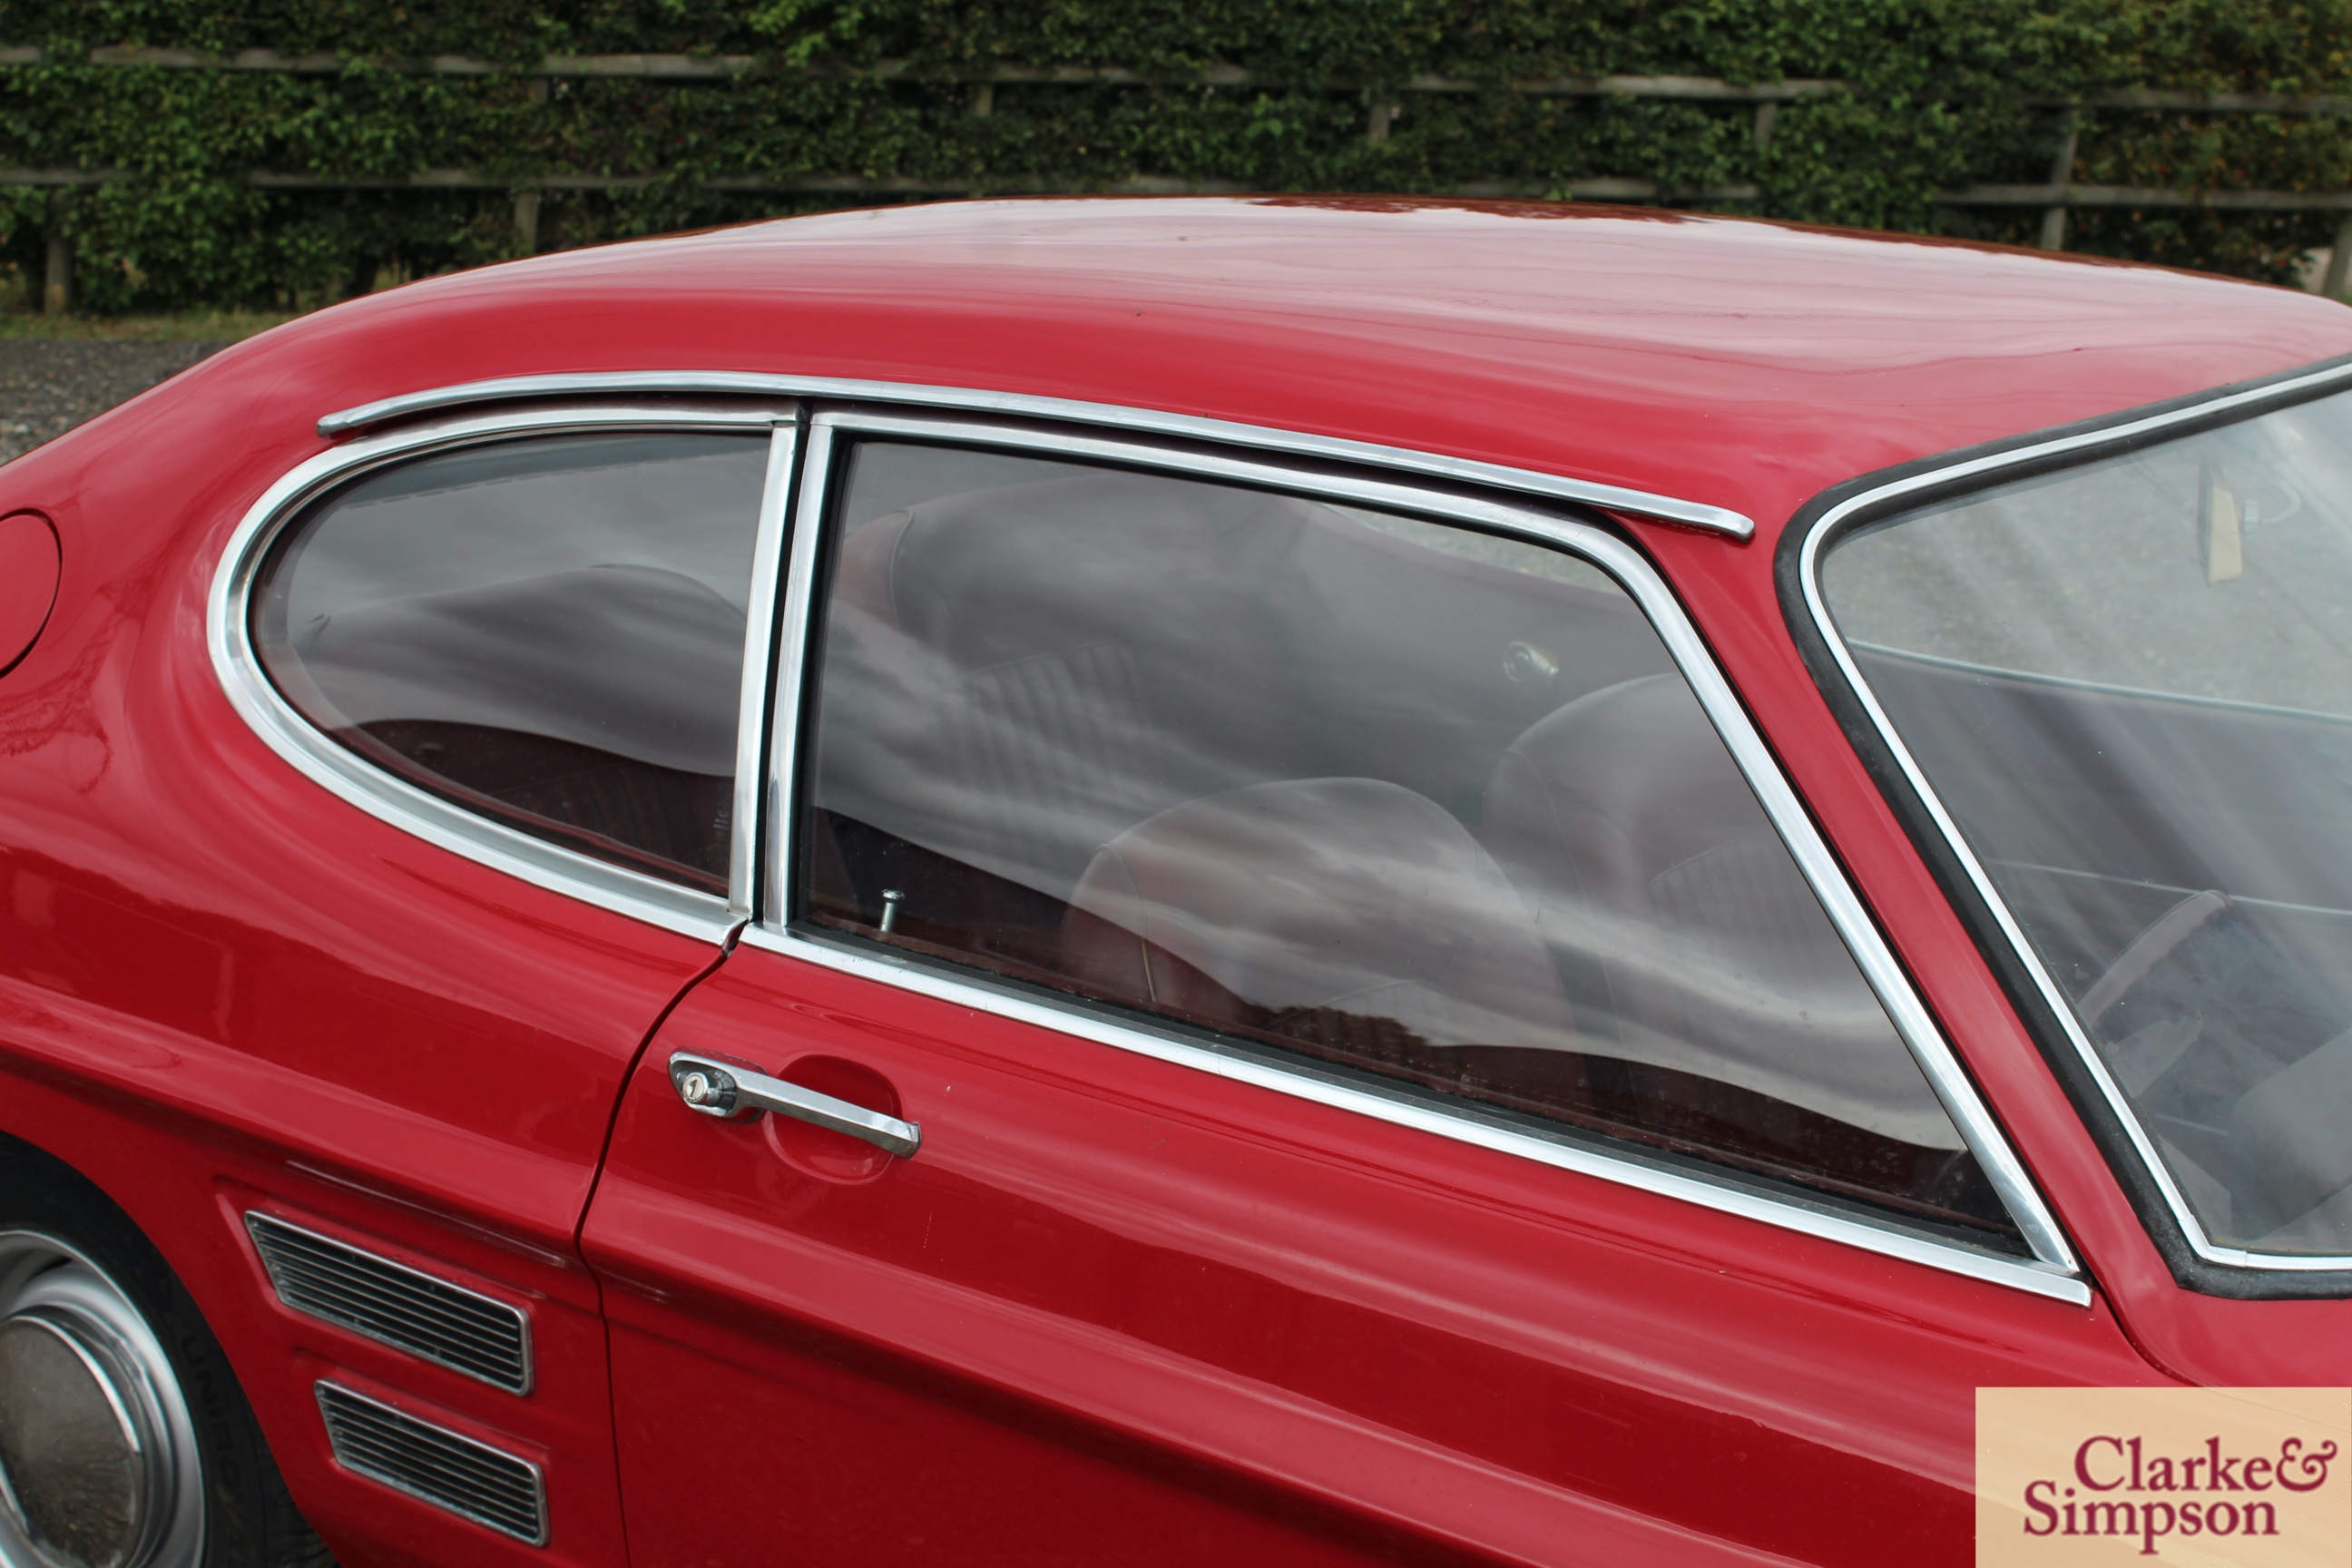 Ford Capri MK1 1300. Registration XBJ 188G. Date o - Image 14 of 65